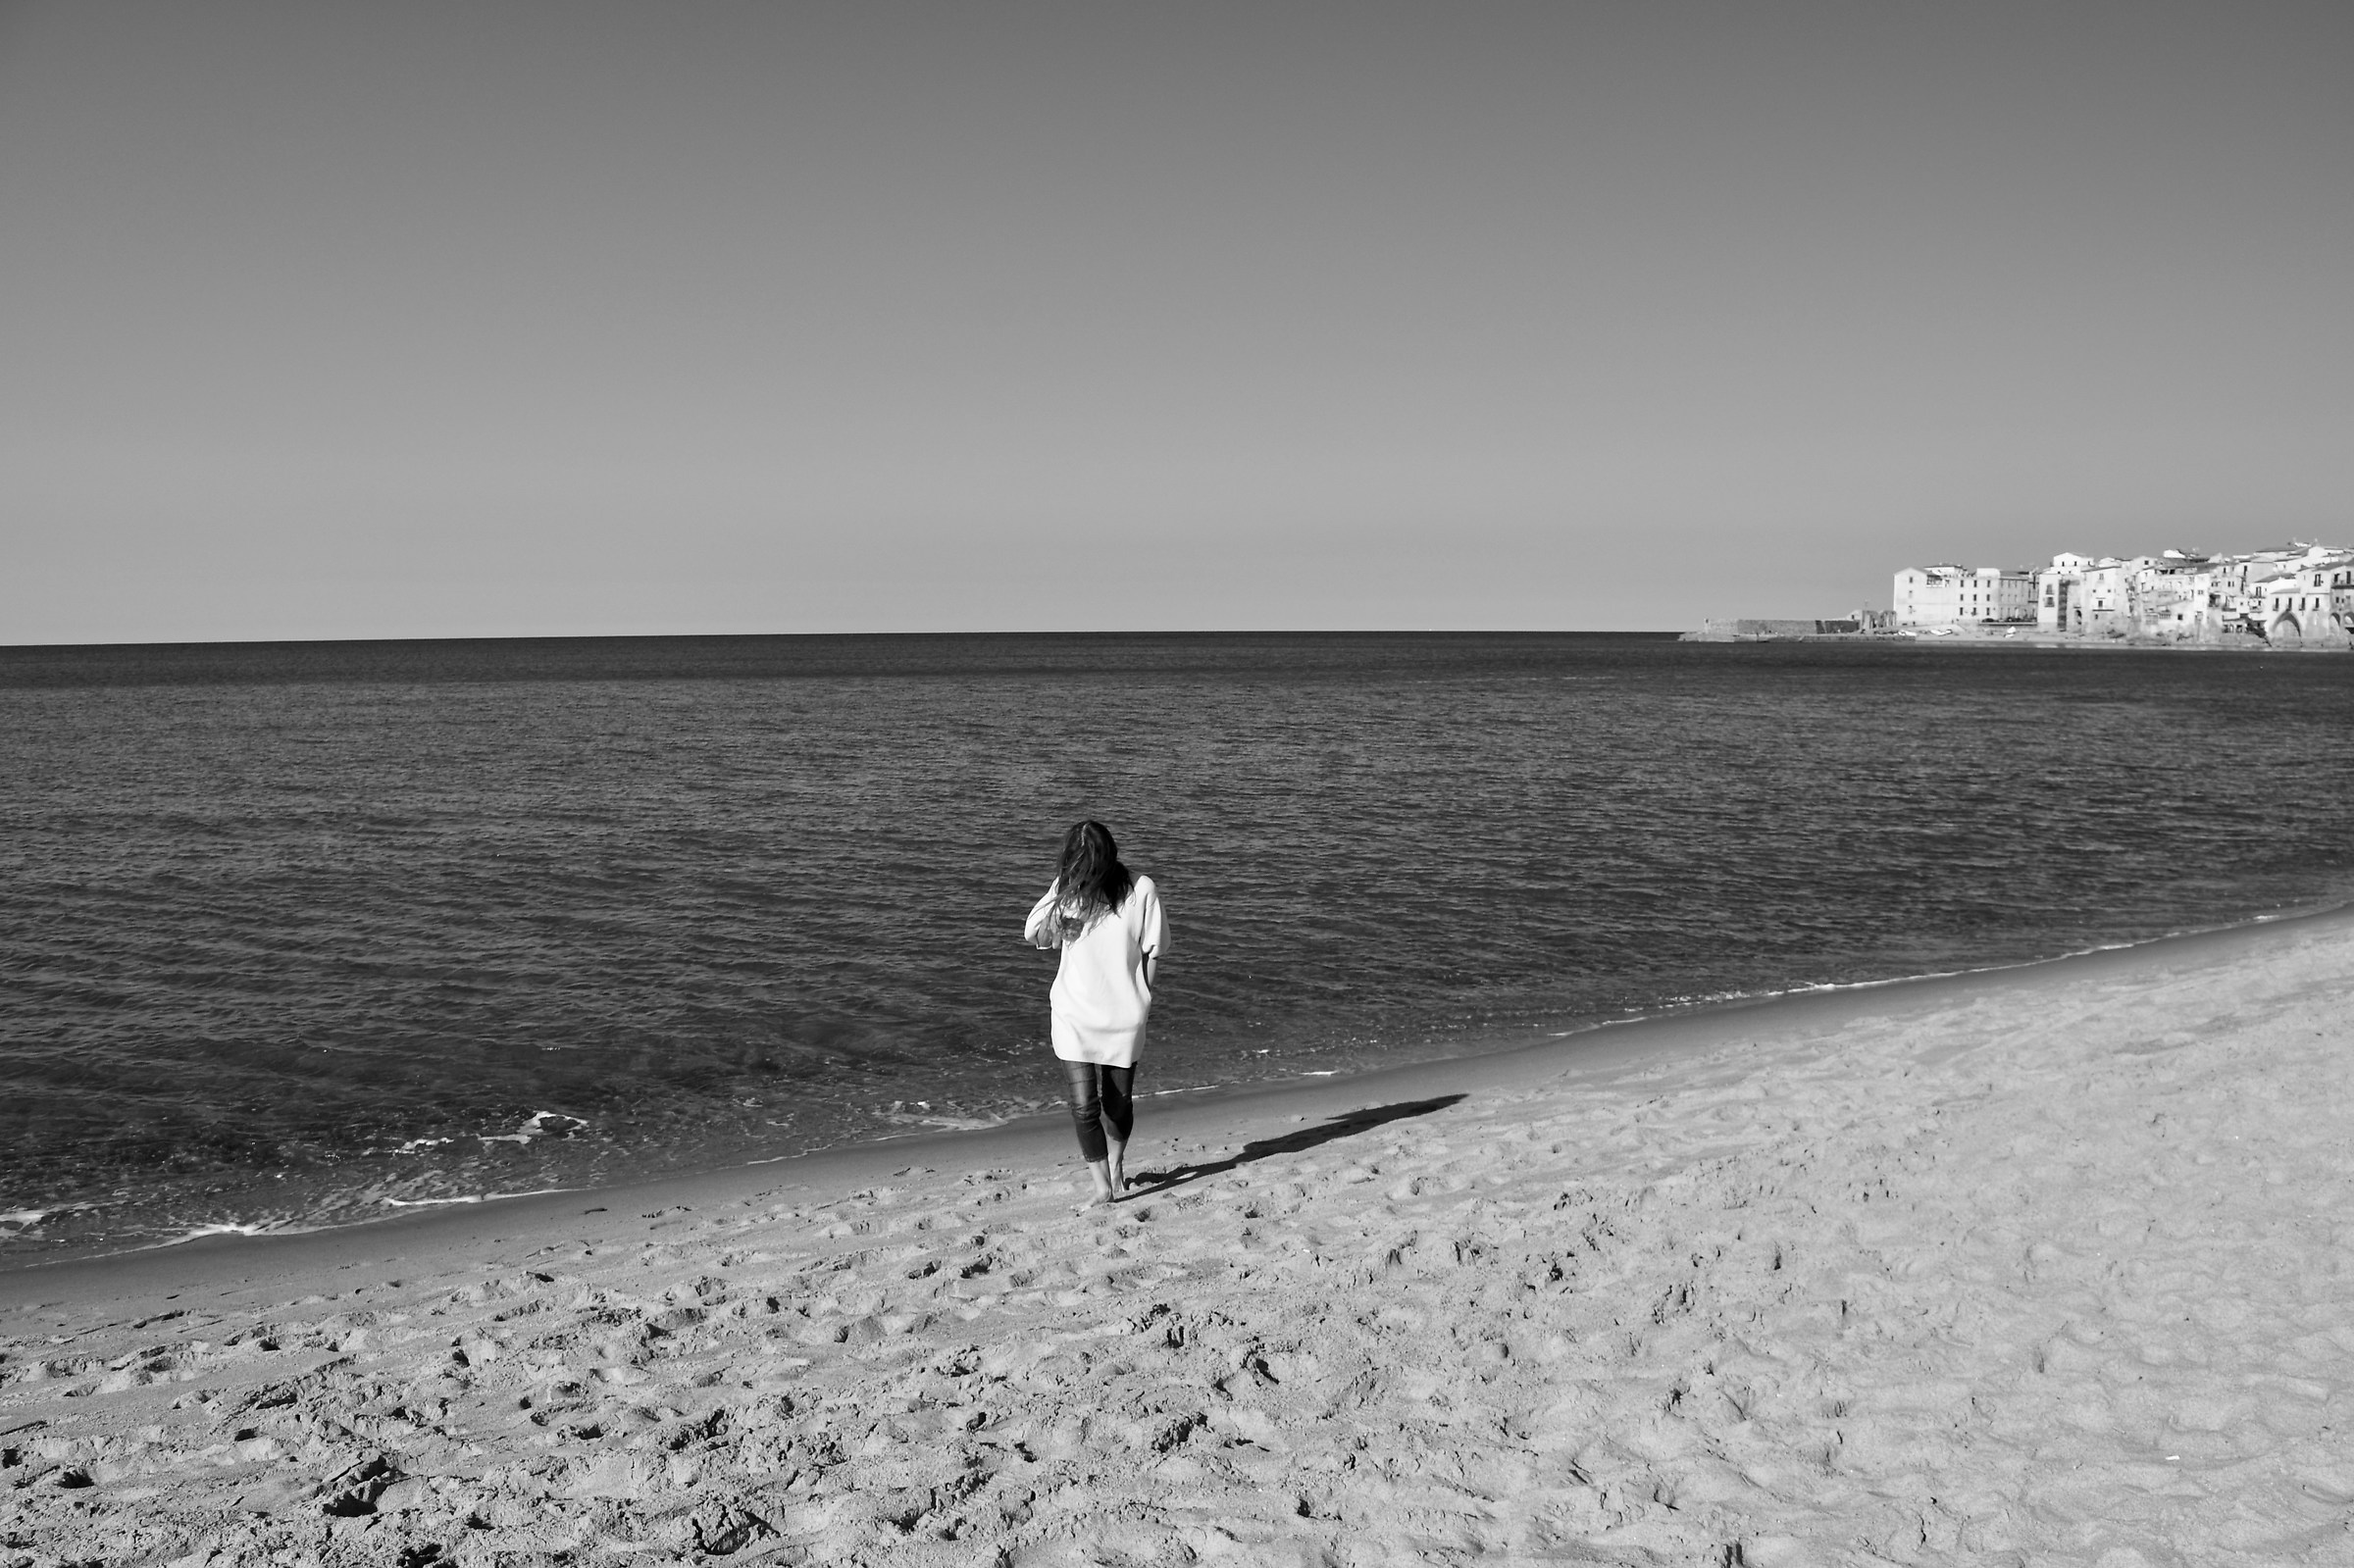 Spiaggia in b&w...